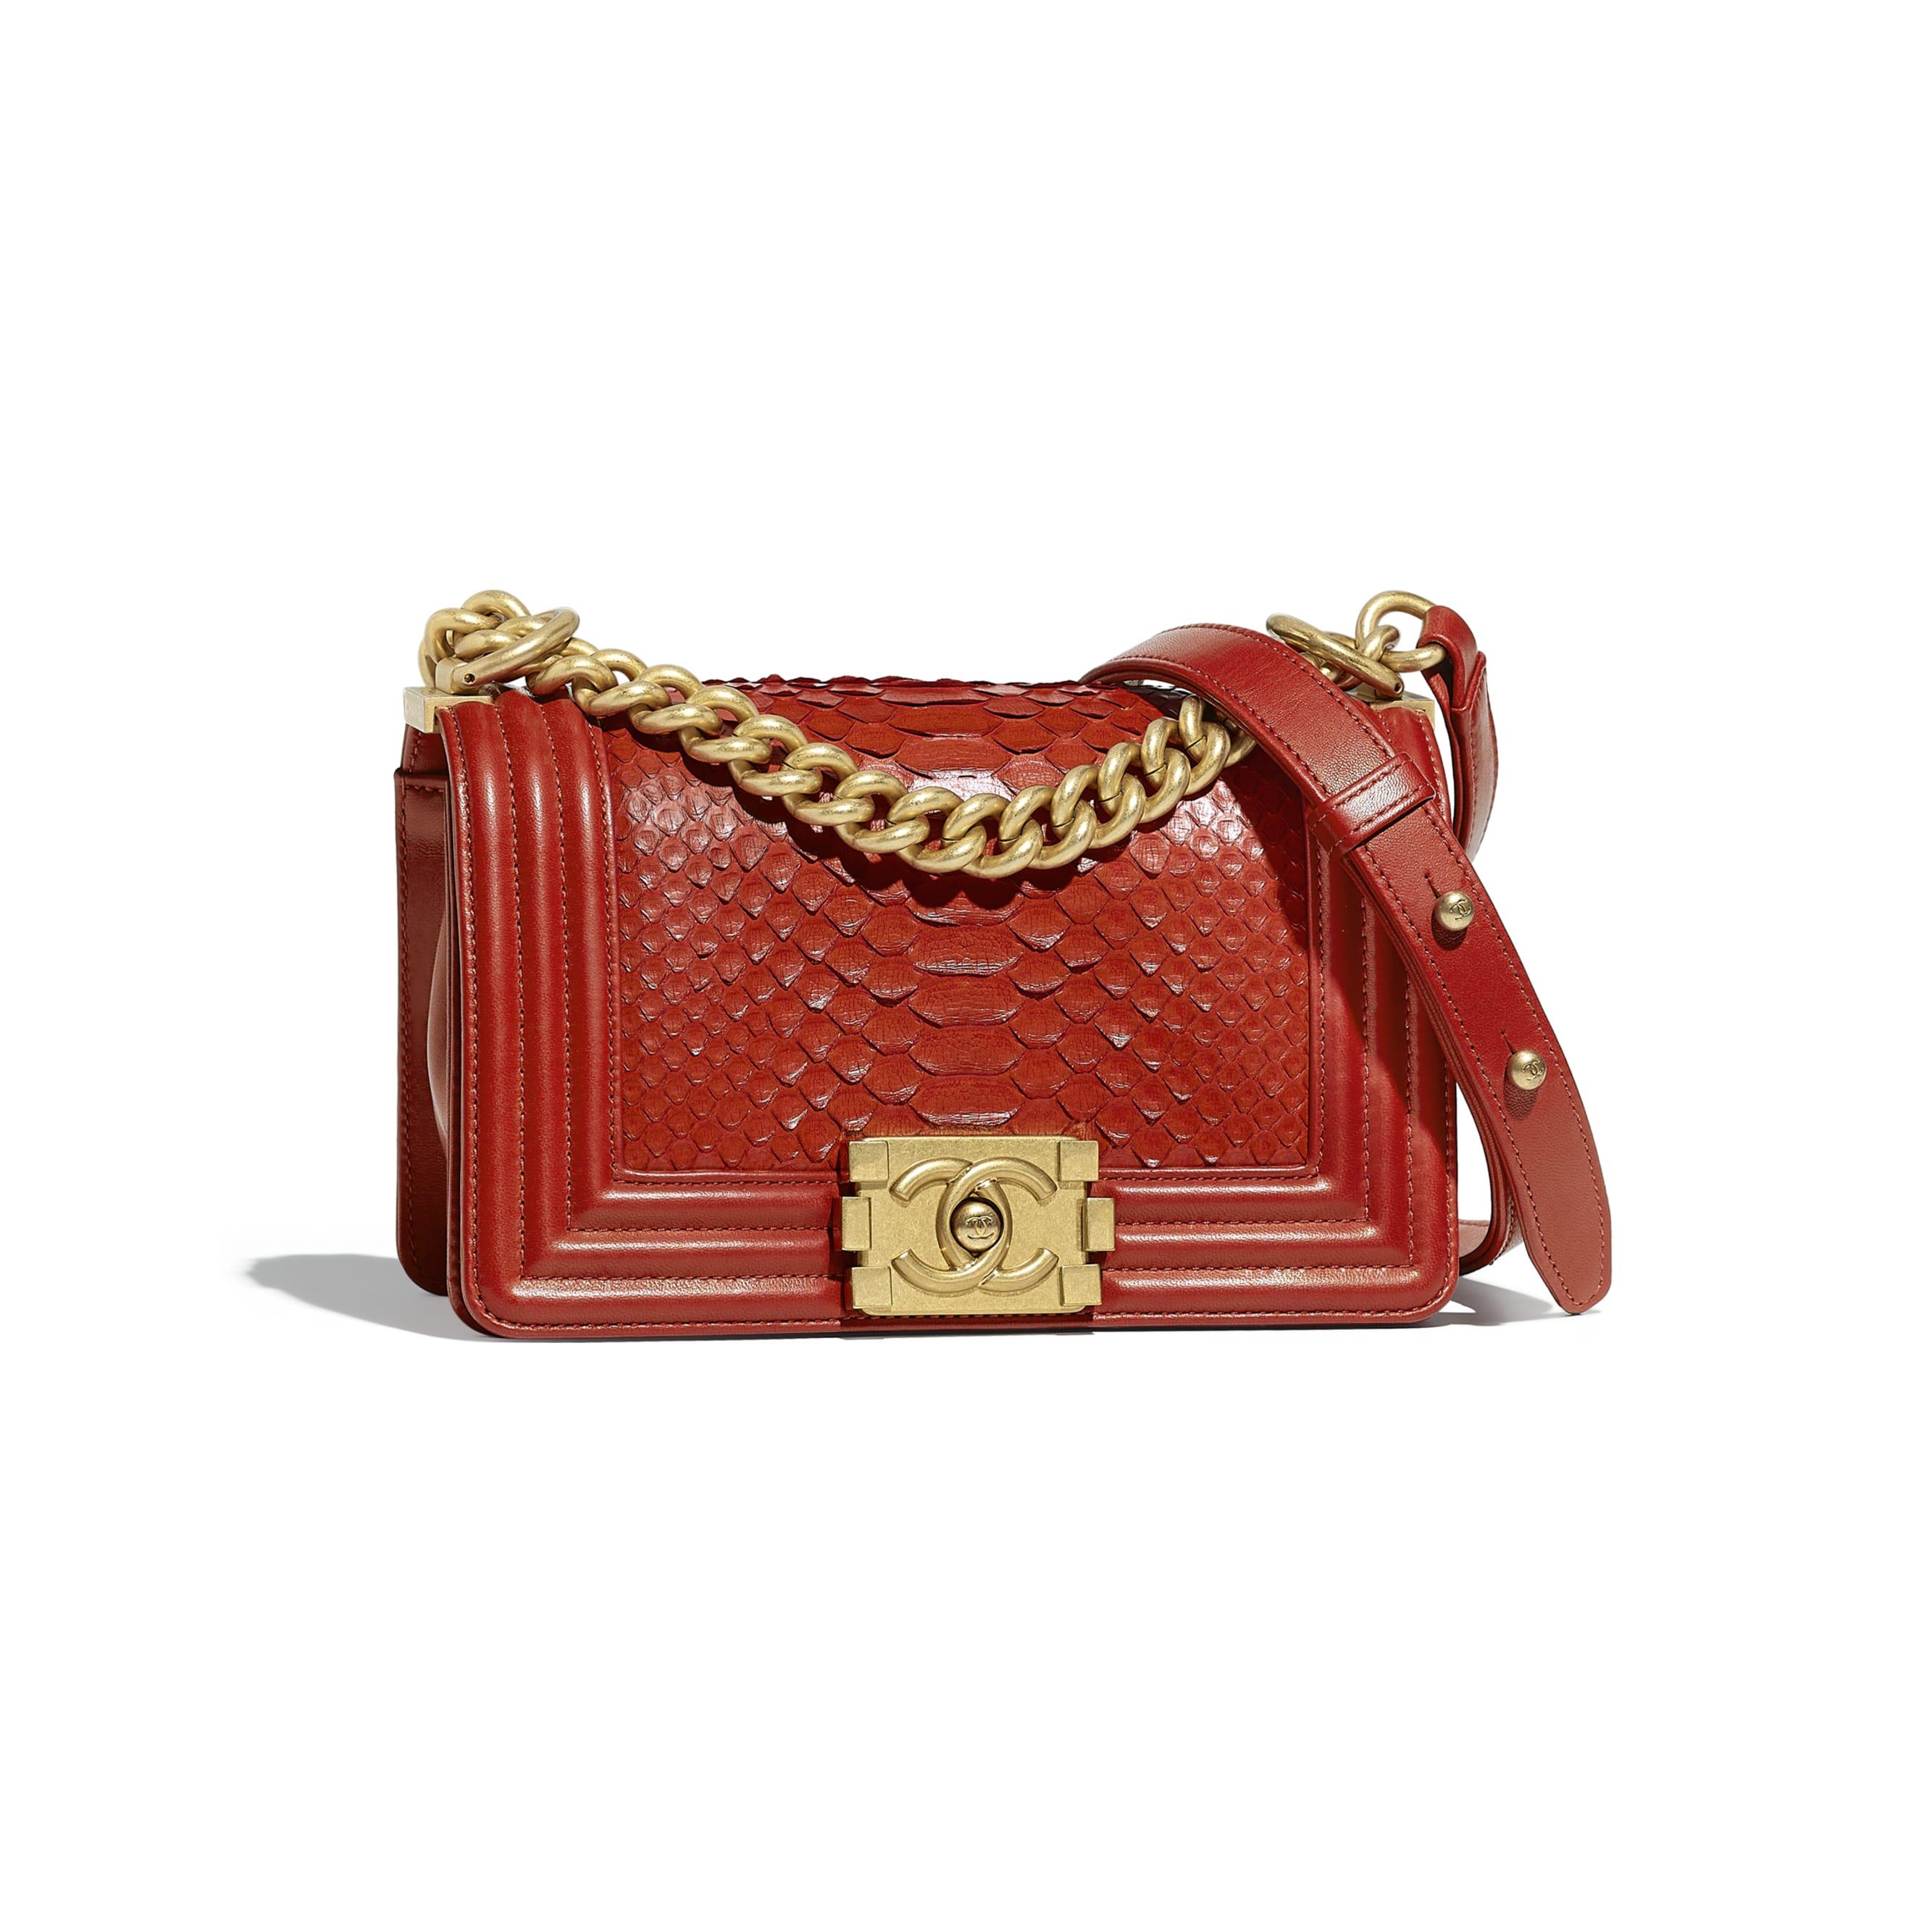 Small BOY CHANEL Handbag - Red - Python, Calfskin & Gold-Tone Metal - Default view - see standard sized version